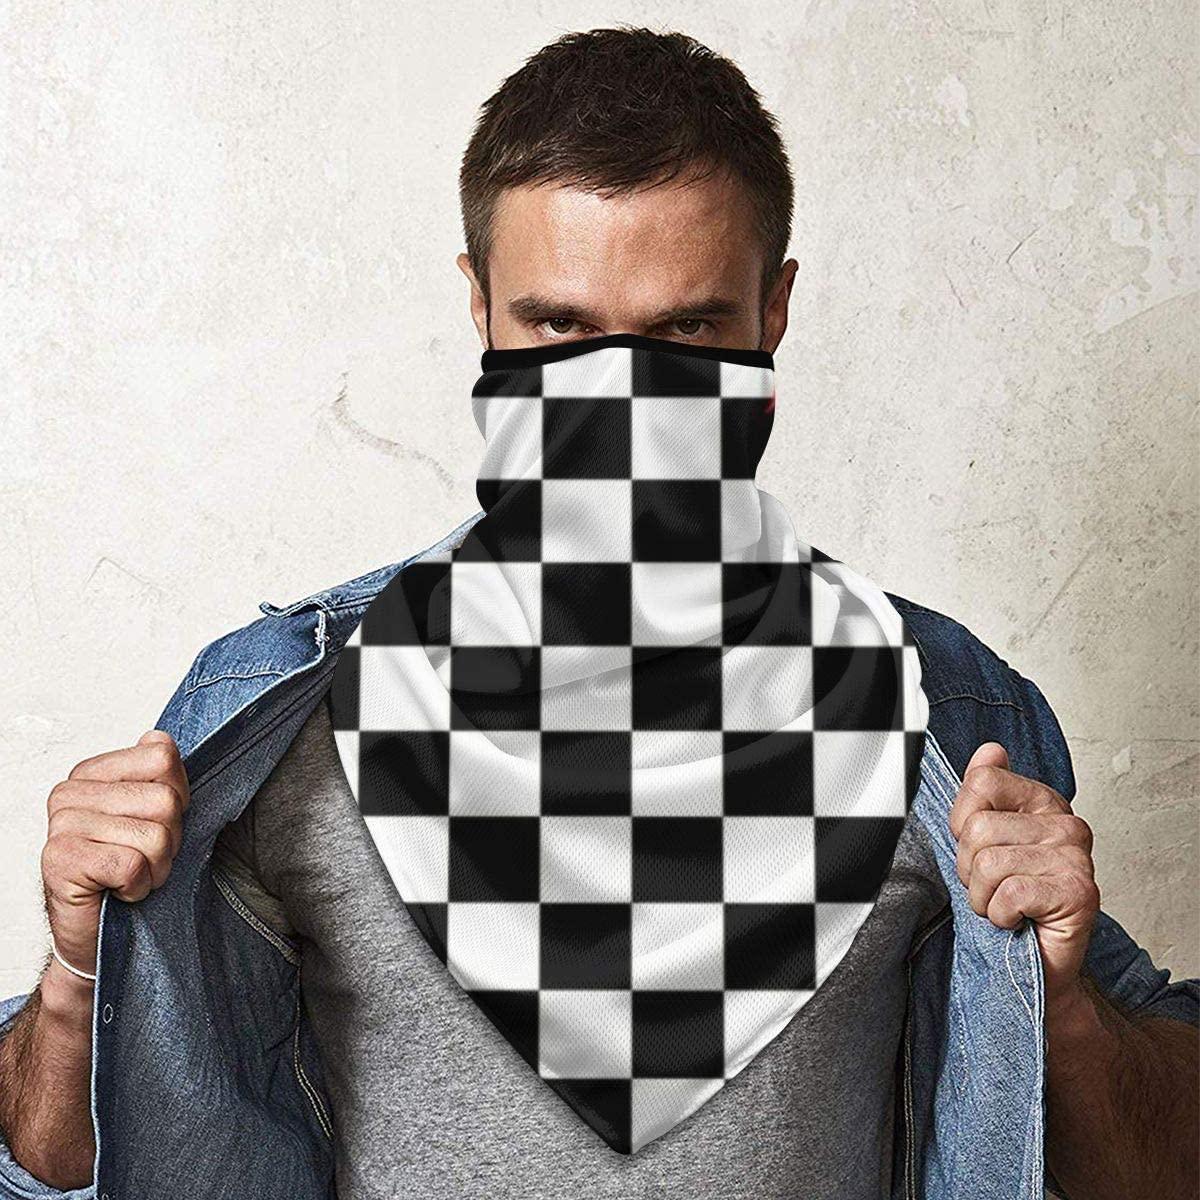 MoonStarDayUp Mens Womens Windproof Sports Face Mask Fire Chess Board Magic Headwear Headscarf Bandanas Motorcycle Headbands Multifunctional Tube Scarf Neck Gaiter Helmet for Fishing